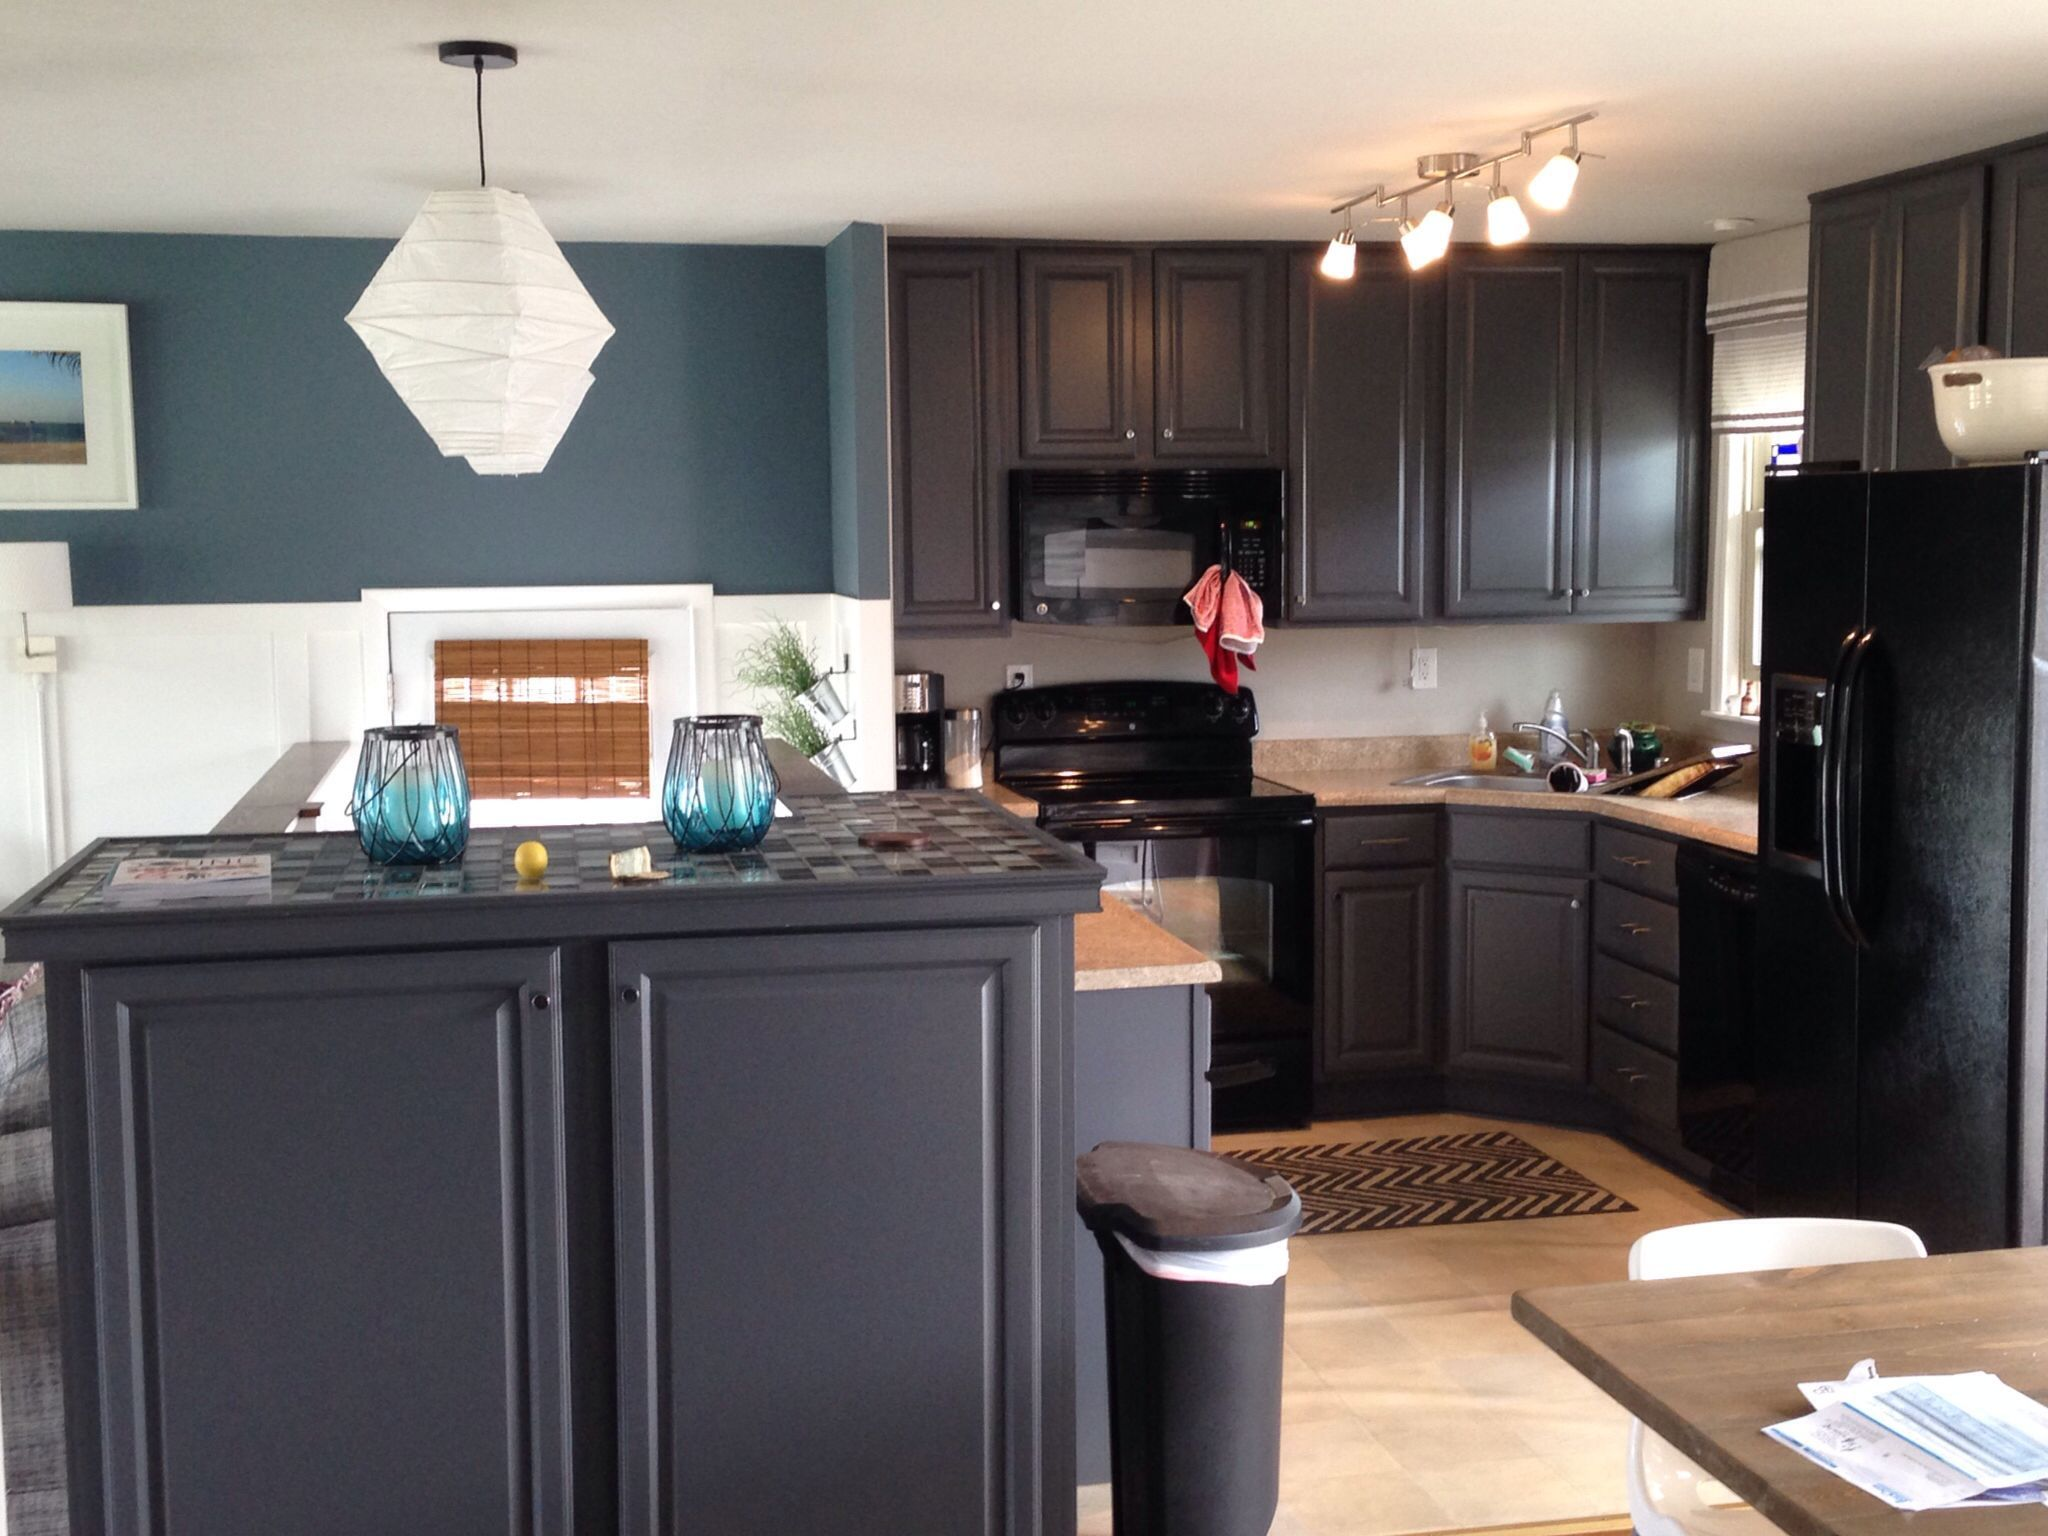 Slate Walls And Peppercorn Cabinets Beautiful Kitchen Cabinets Kitchen Cabinet Colors Elegant Kitchens